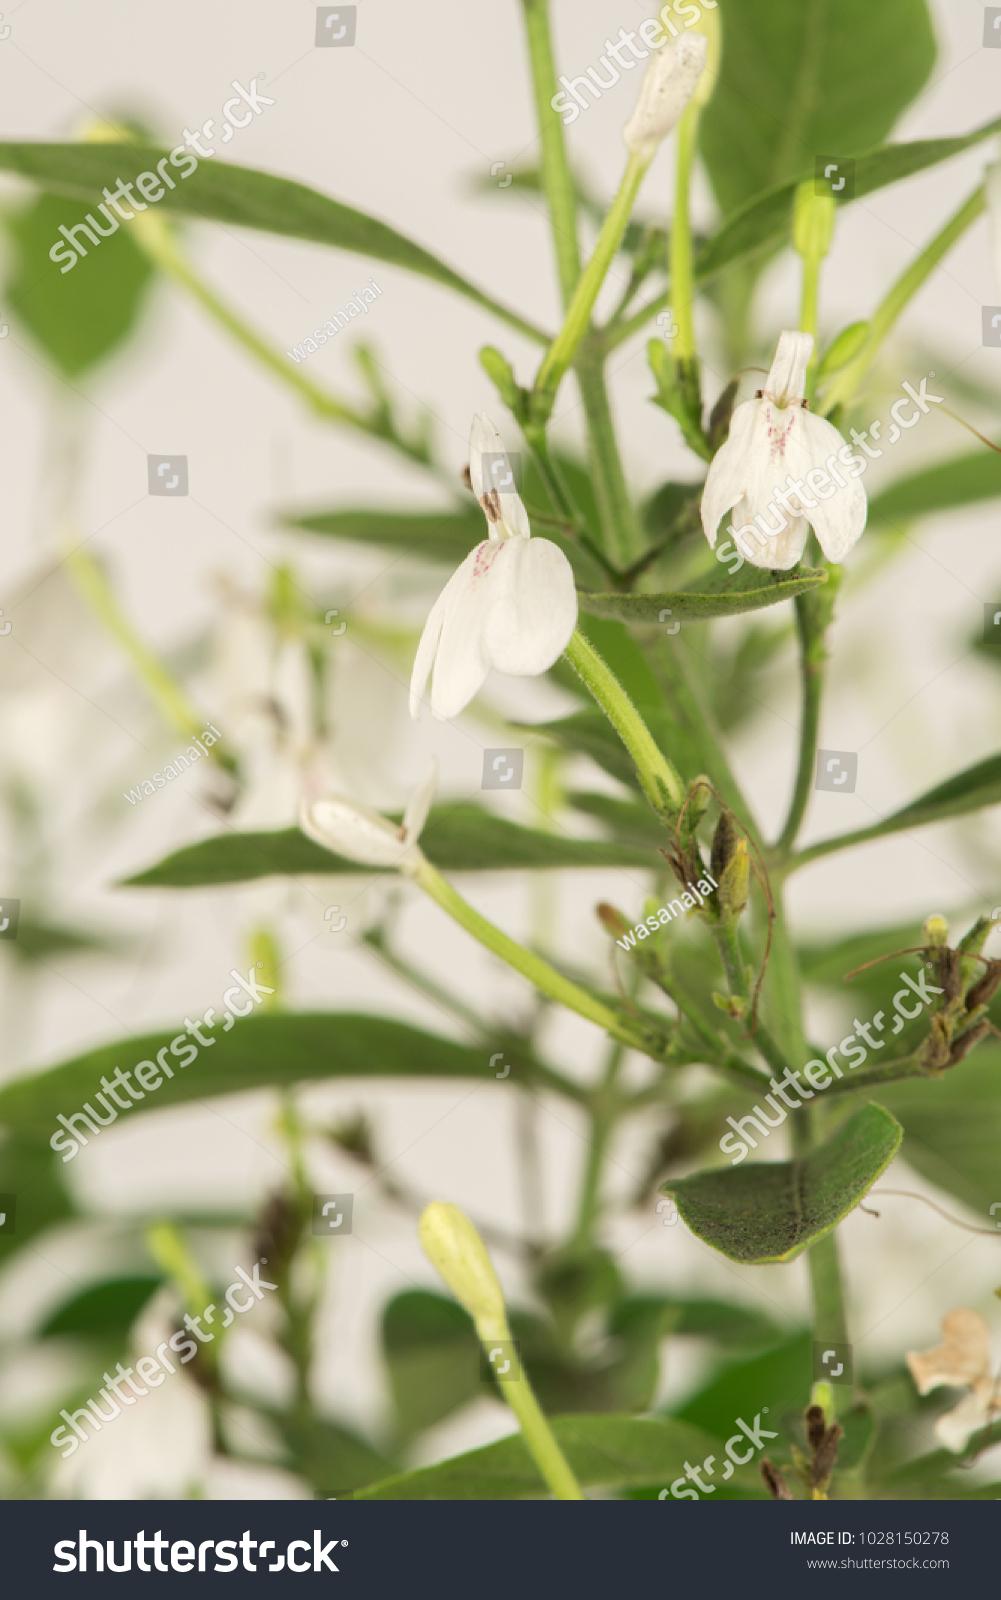 White Crane Flower Or Rhinacanthus Nasutus Plant Have Property